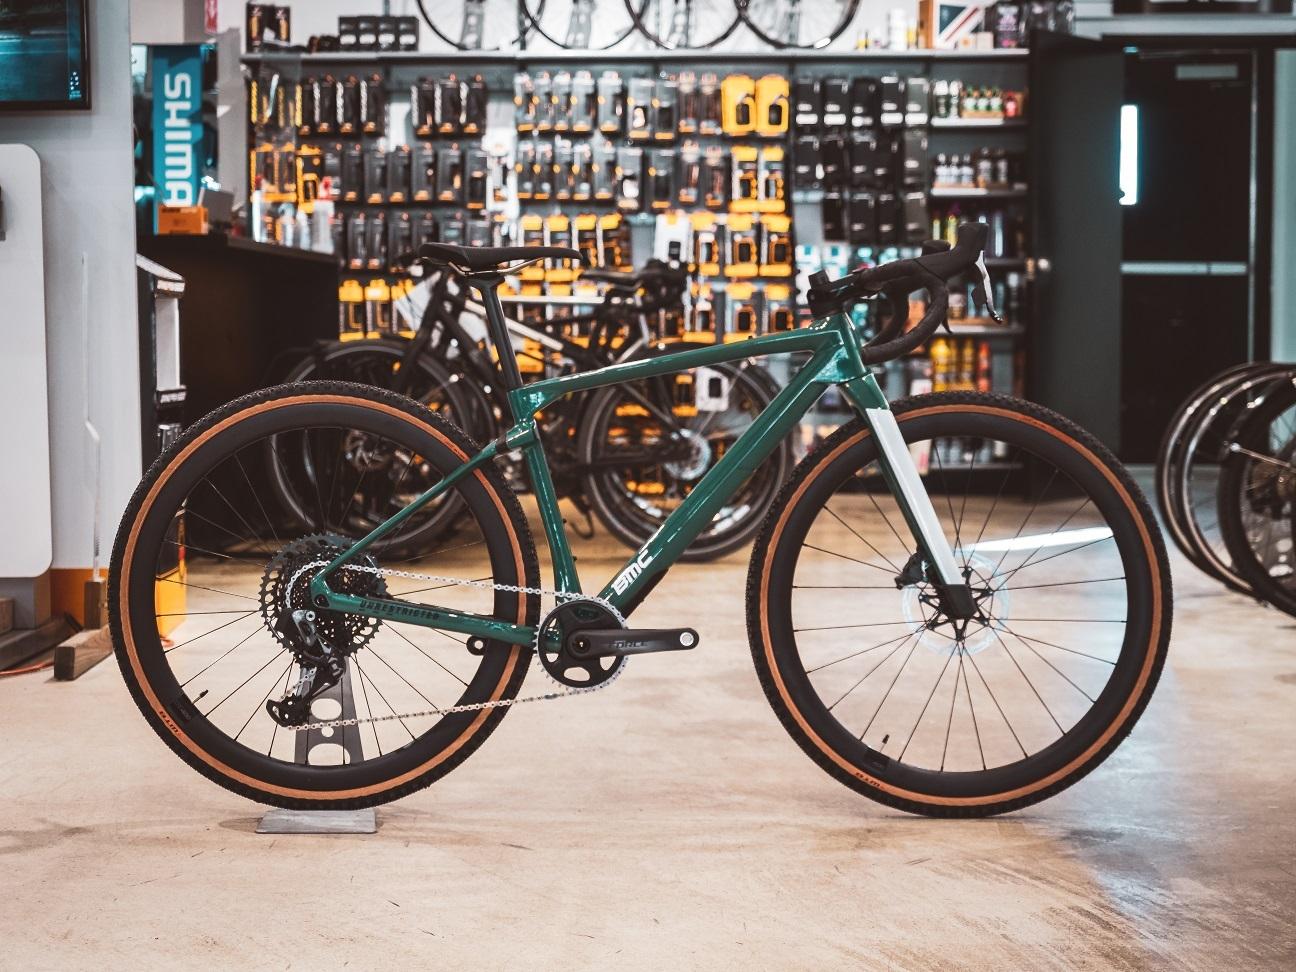 2021 BMC URS 01 Two Gravel bike and professional cyclist Lex Albrecht